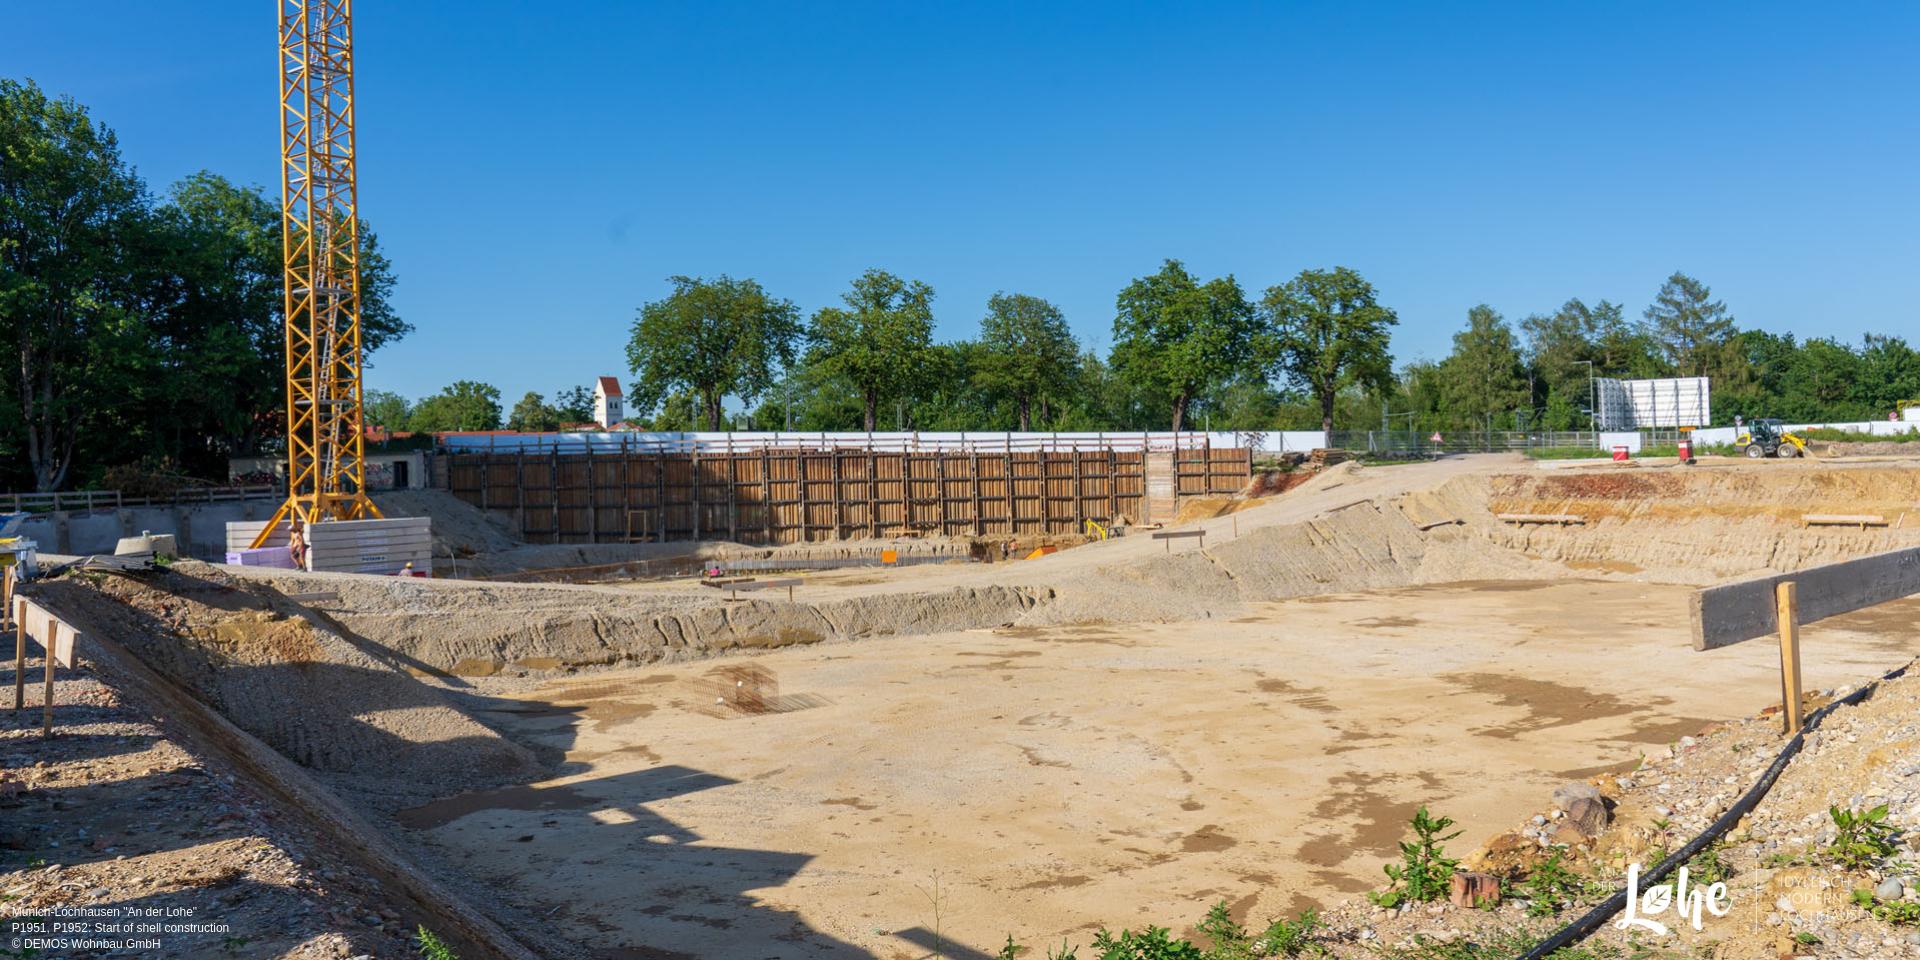 'An der Lohe' in Munich-Lochhausen: Start of shell construction